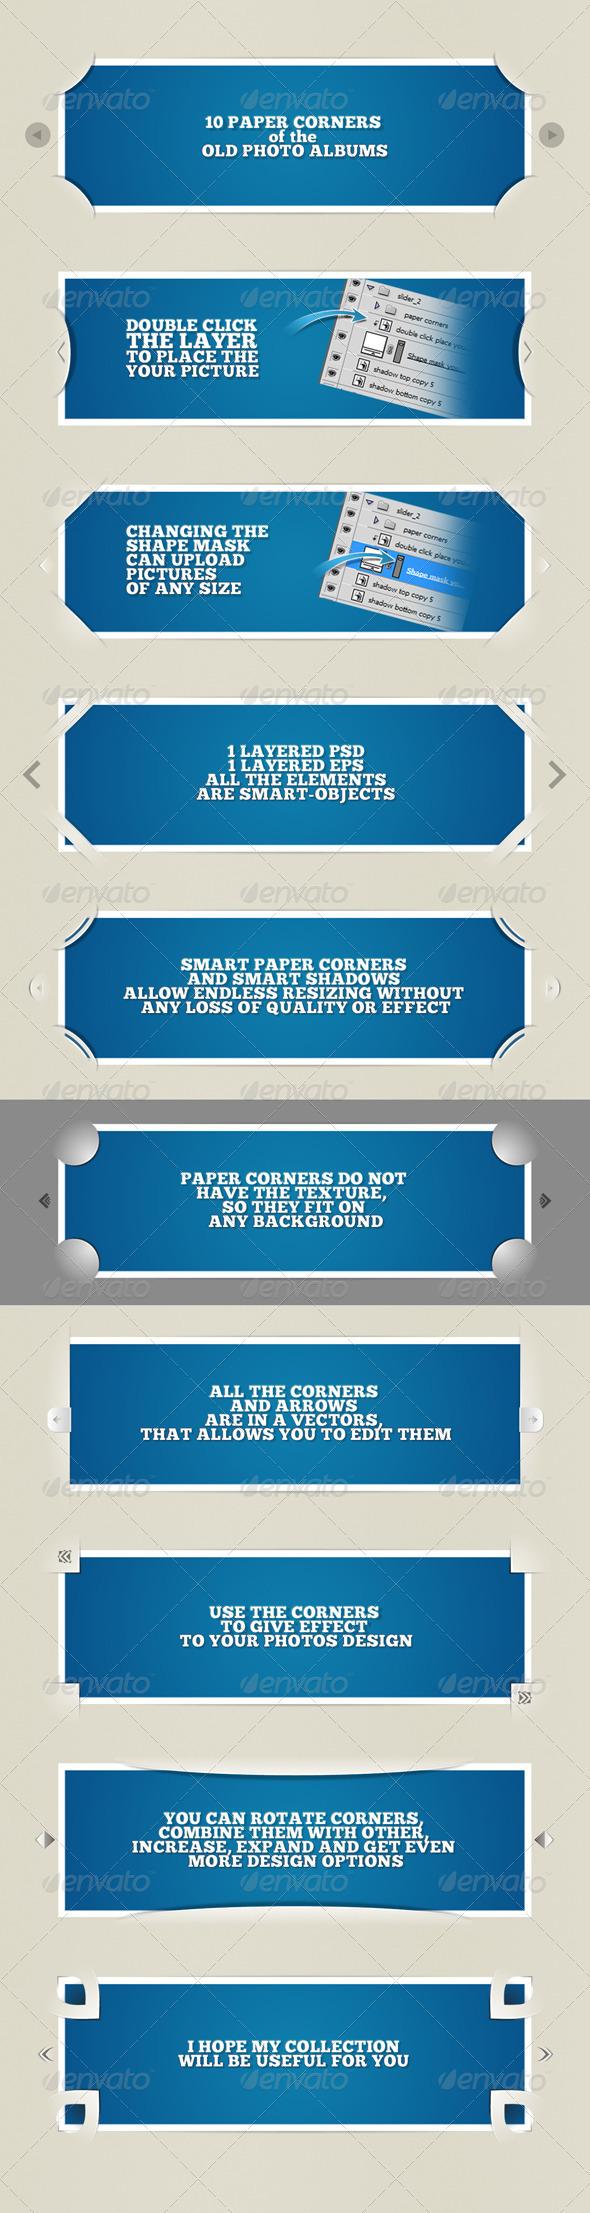 10 paper corners for photos - Miscellaneous Web Elements